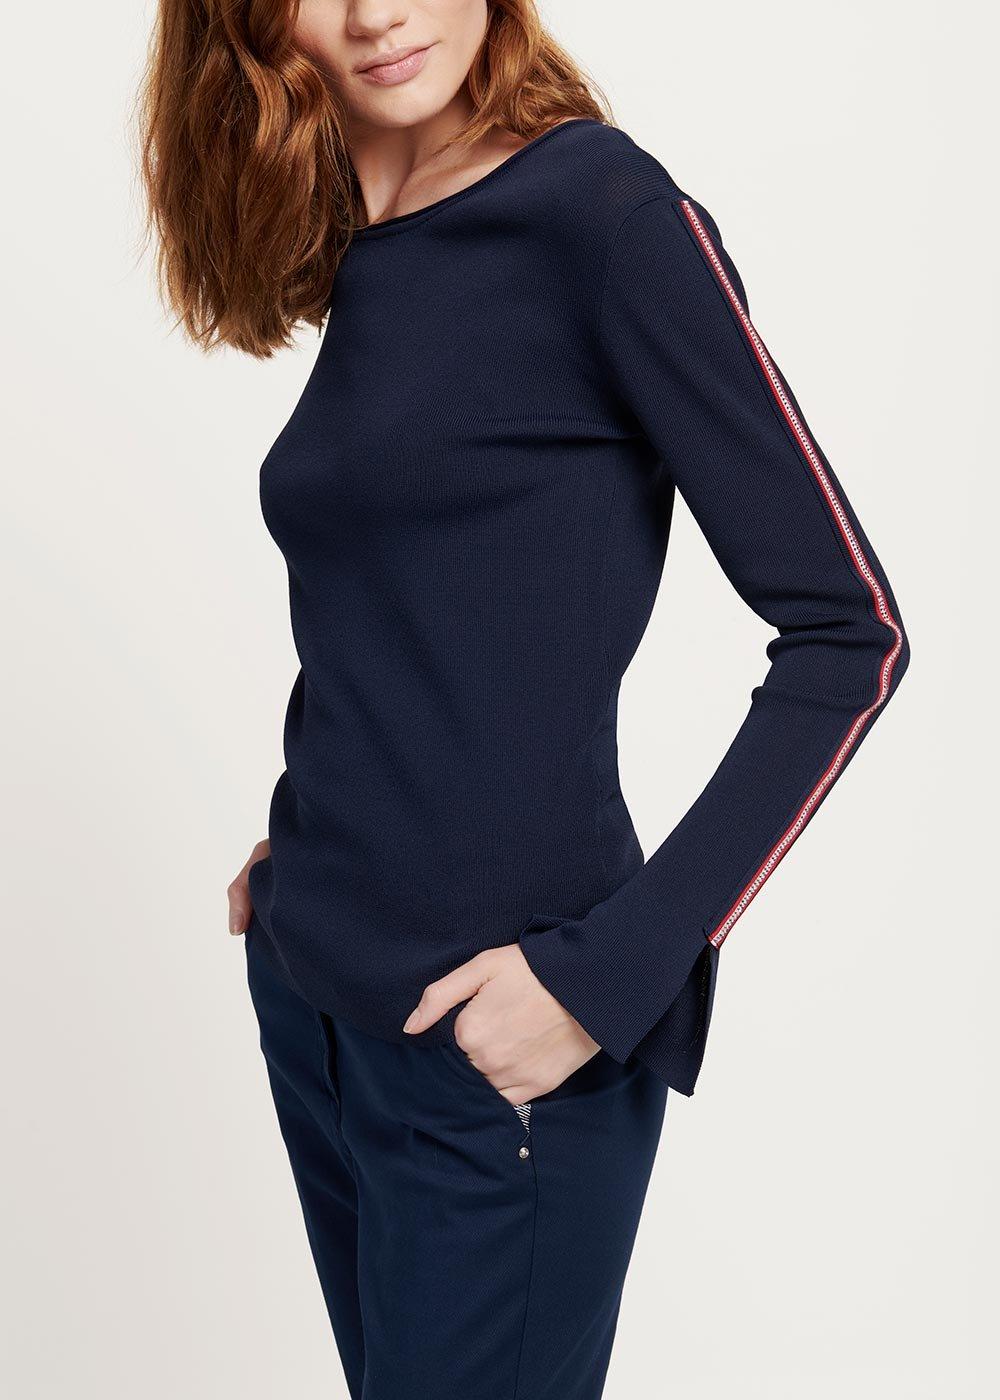 Melyssa sweater with ribbon details - Medium Blue - Woman